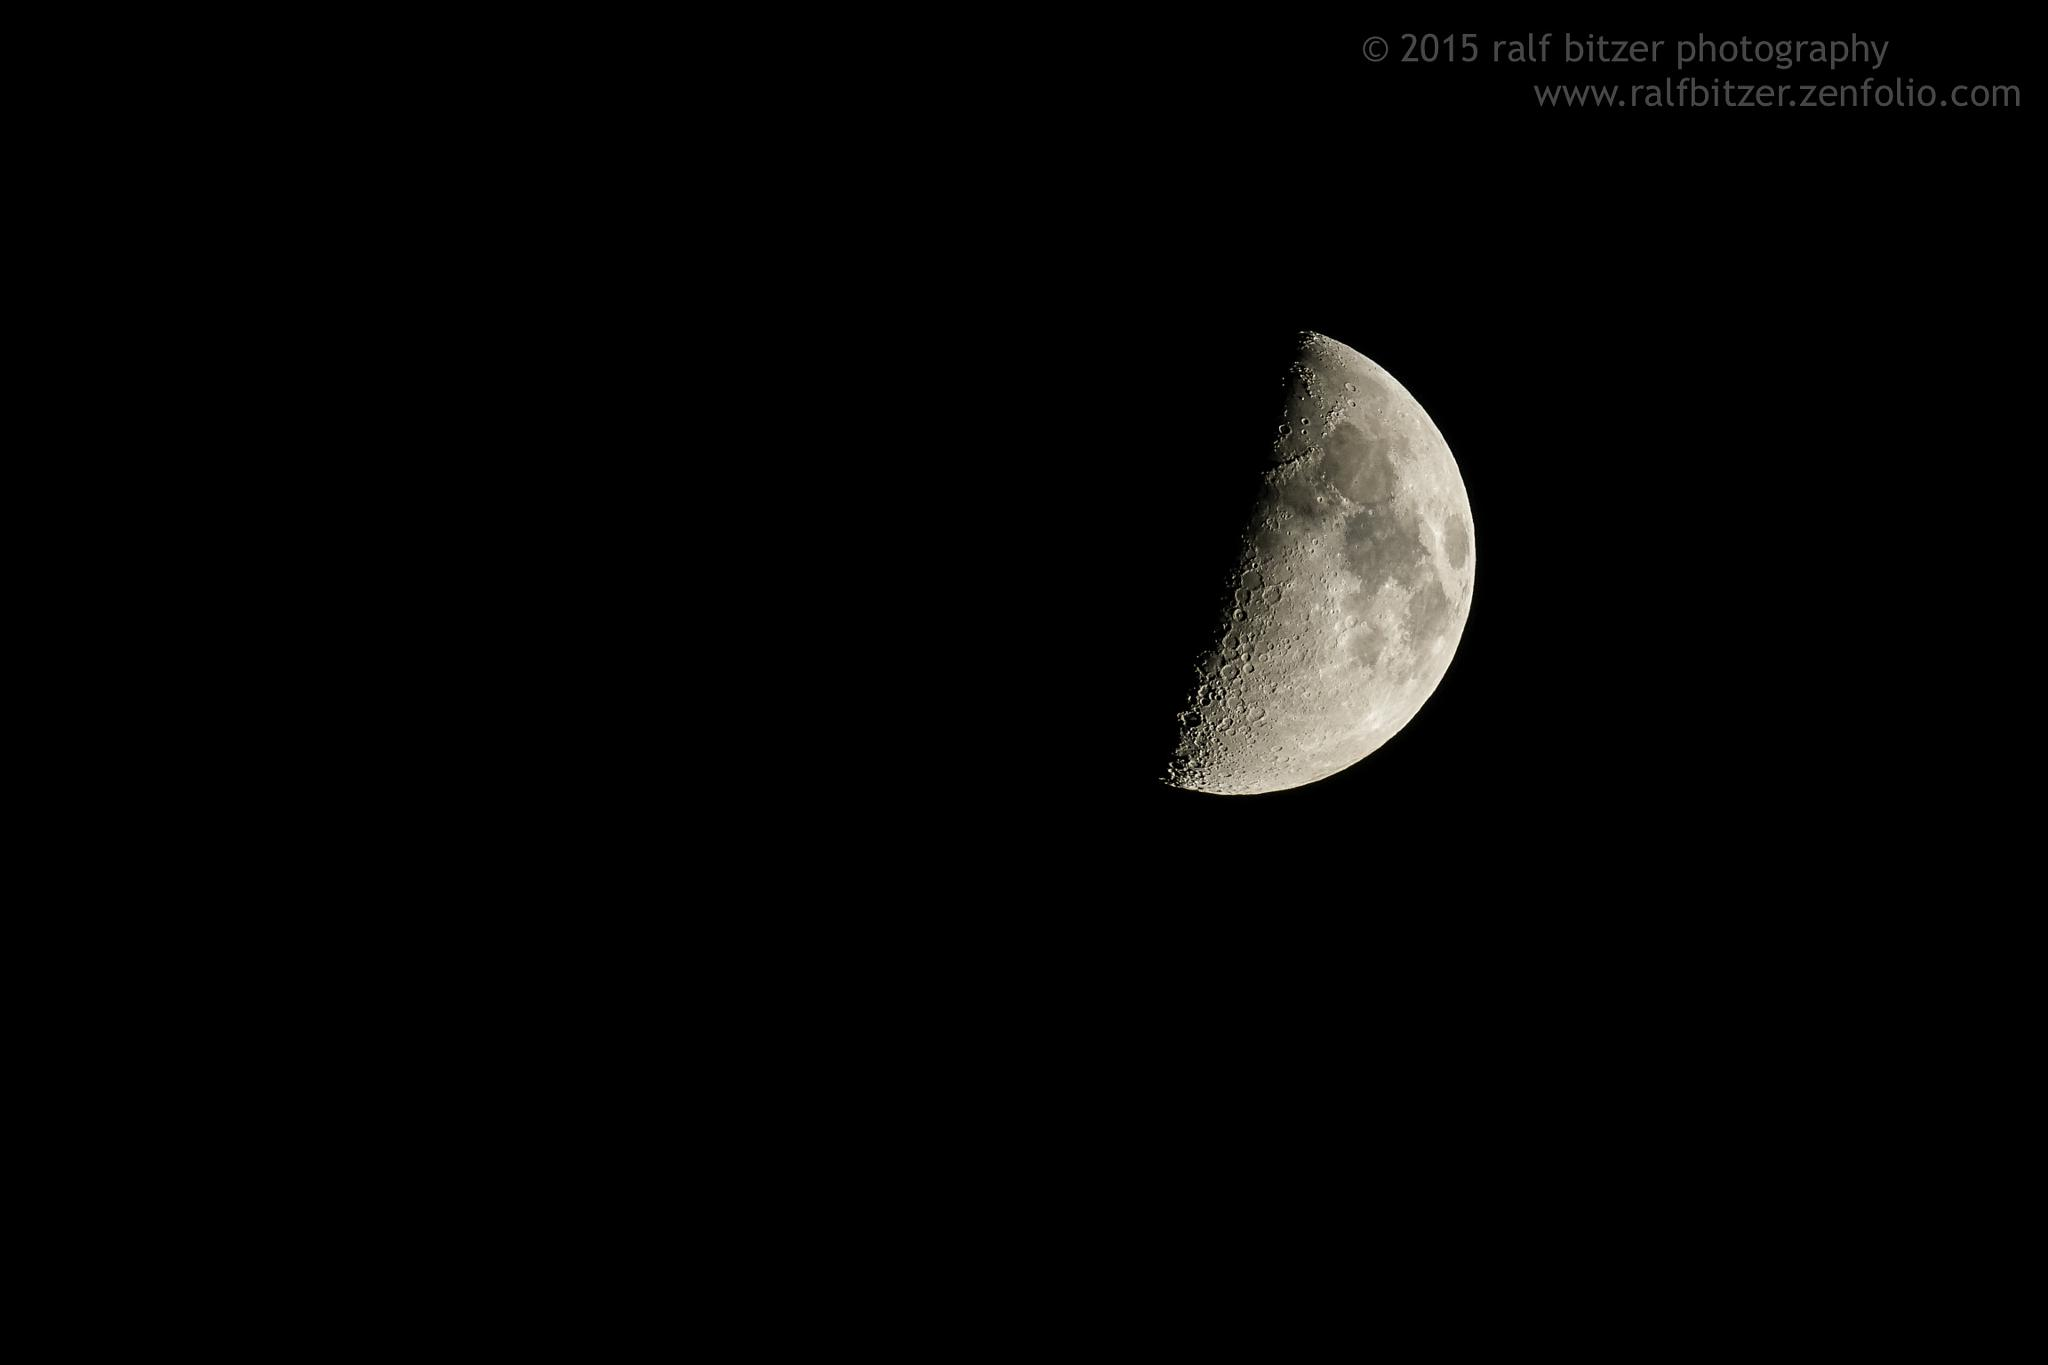 Moon by Ralf Bitzer